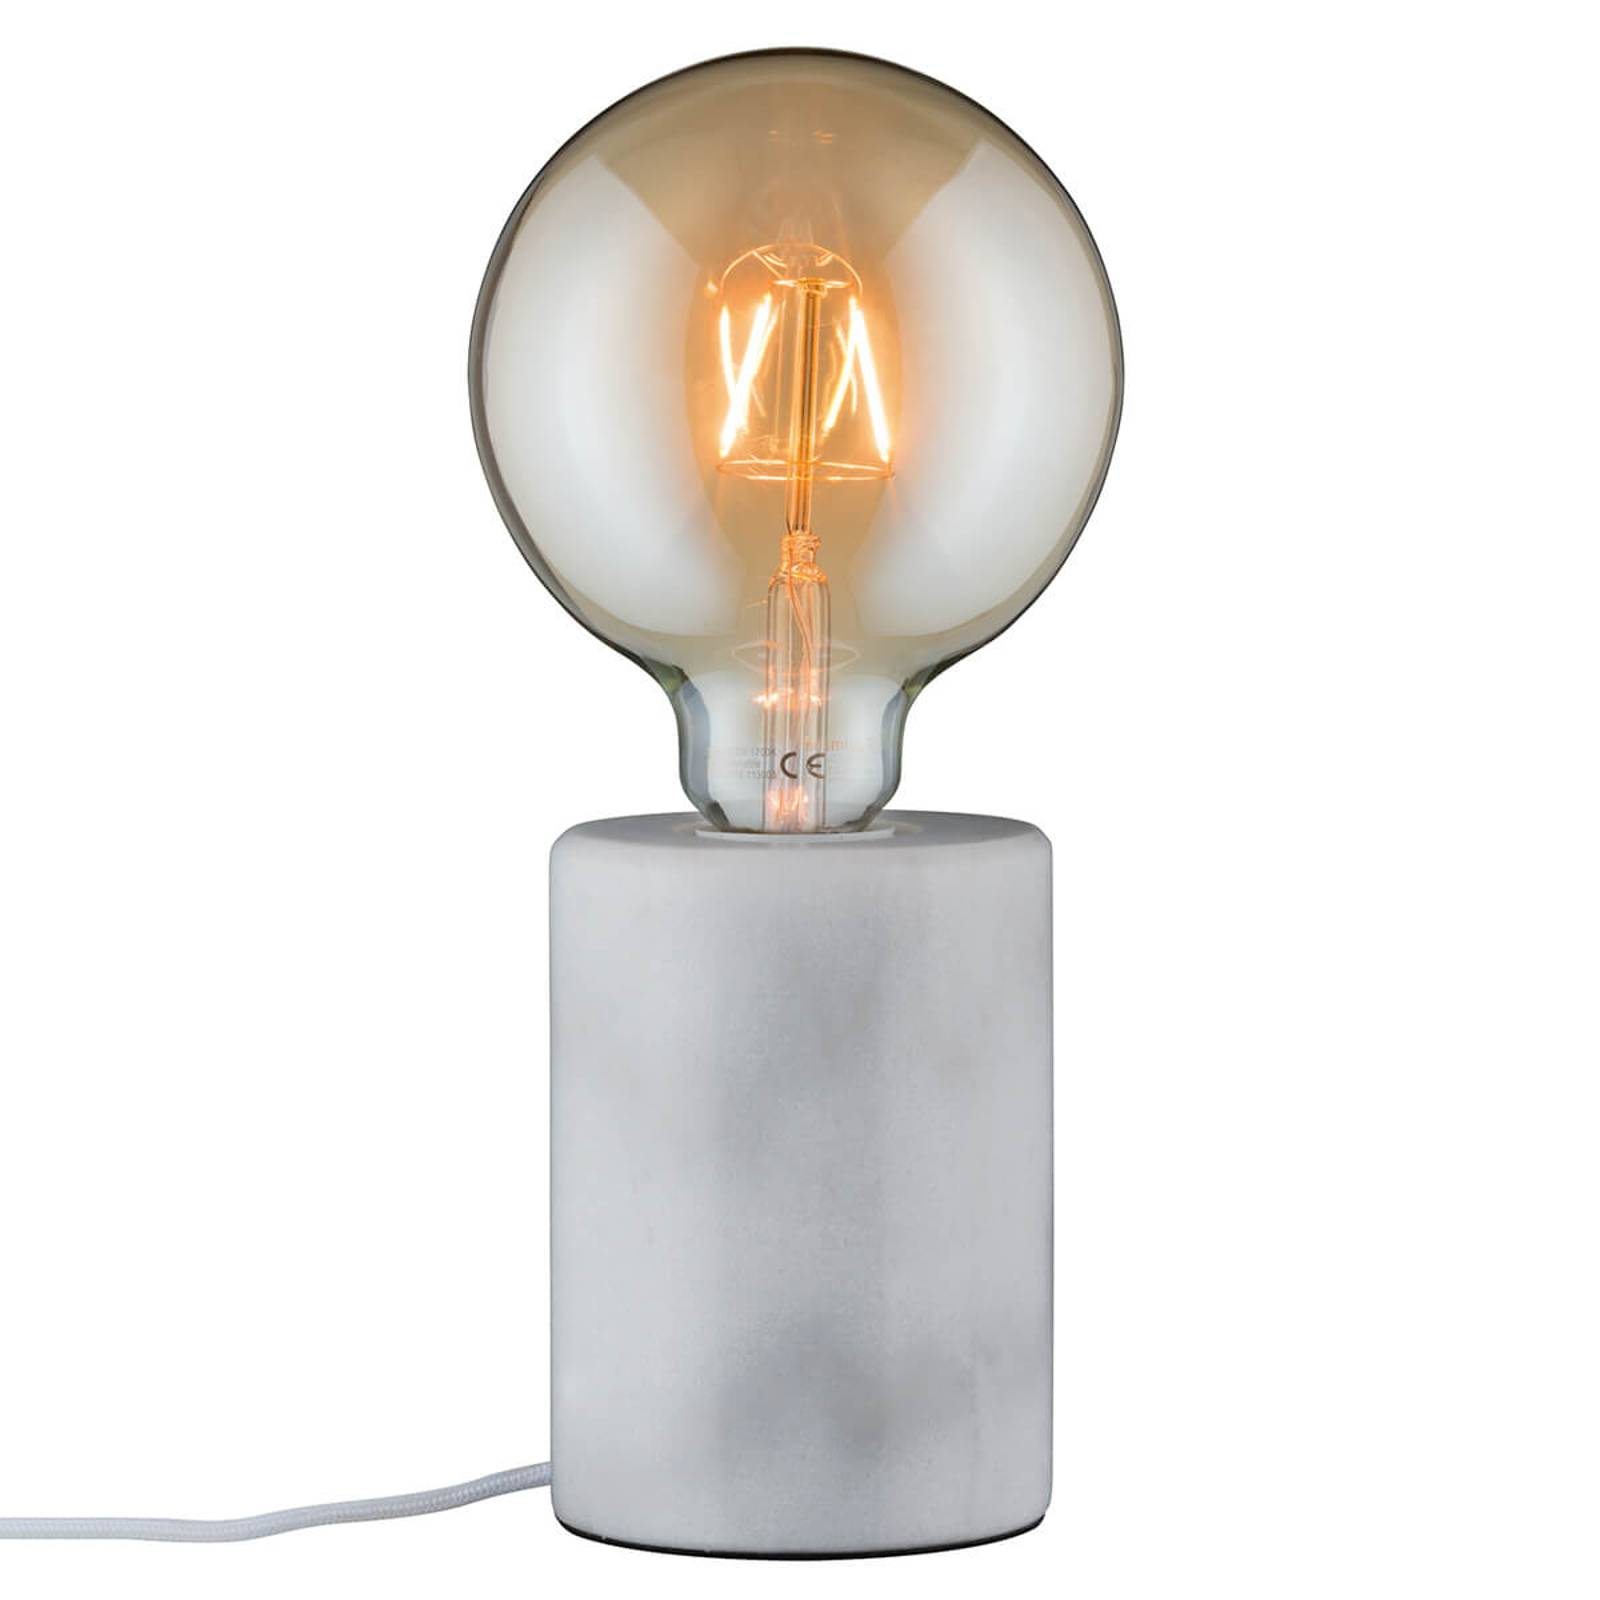 Witte puristische marmeren tafellamp Nordin